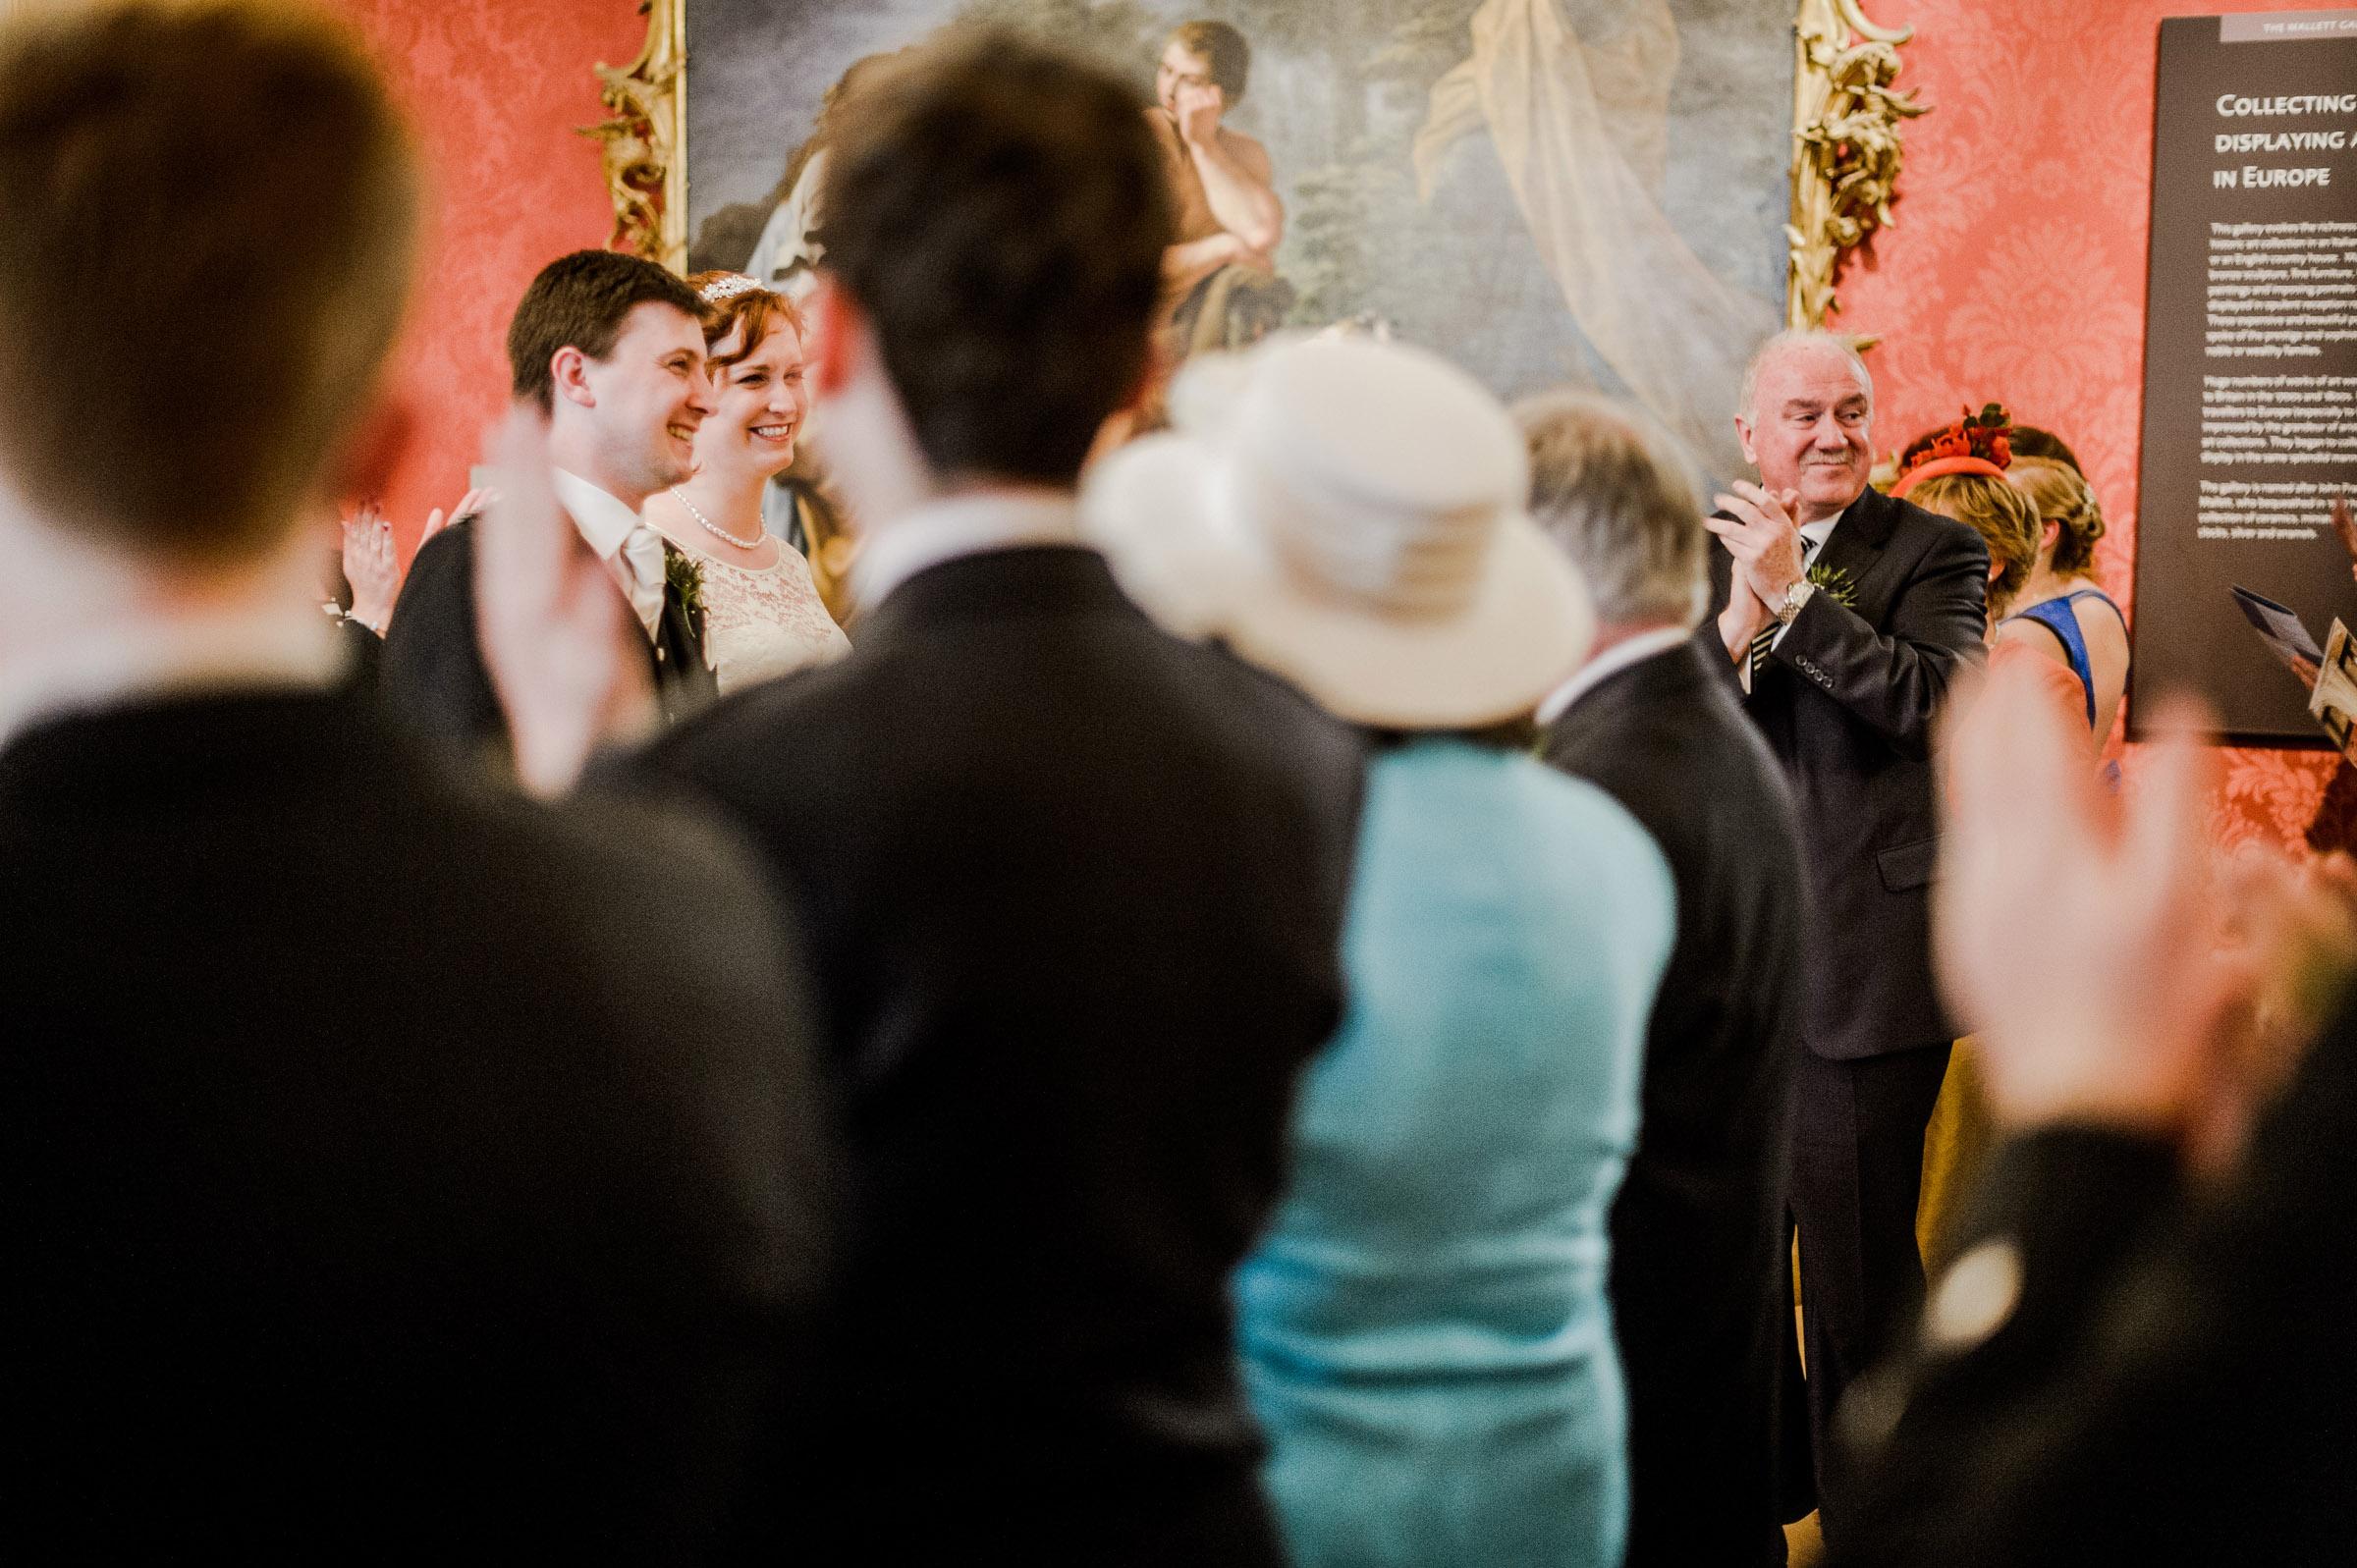 Ashmolean-Museum-Wedding-Pictures-0030.jpg